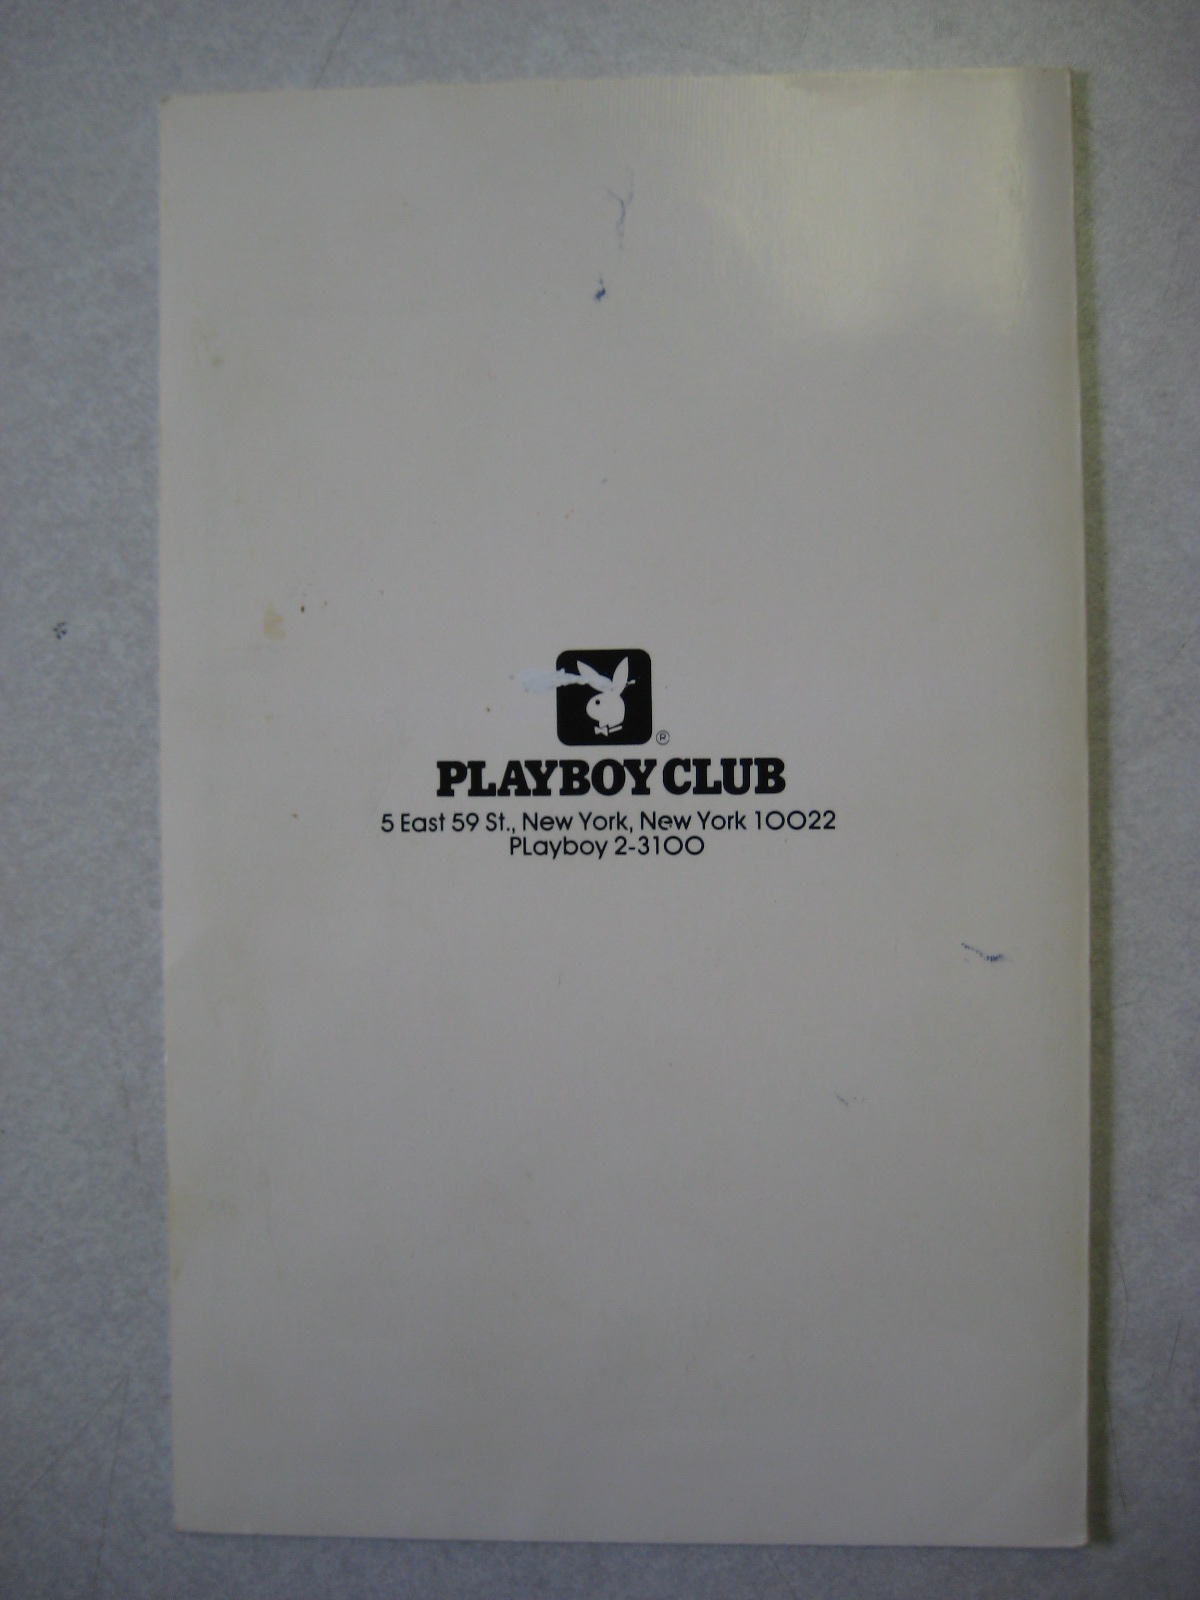 Playboy Club New York Menu